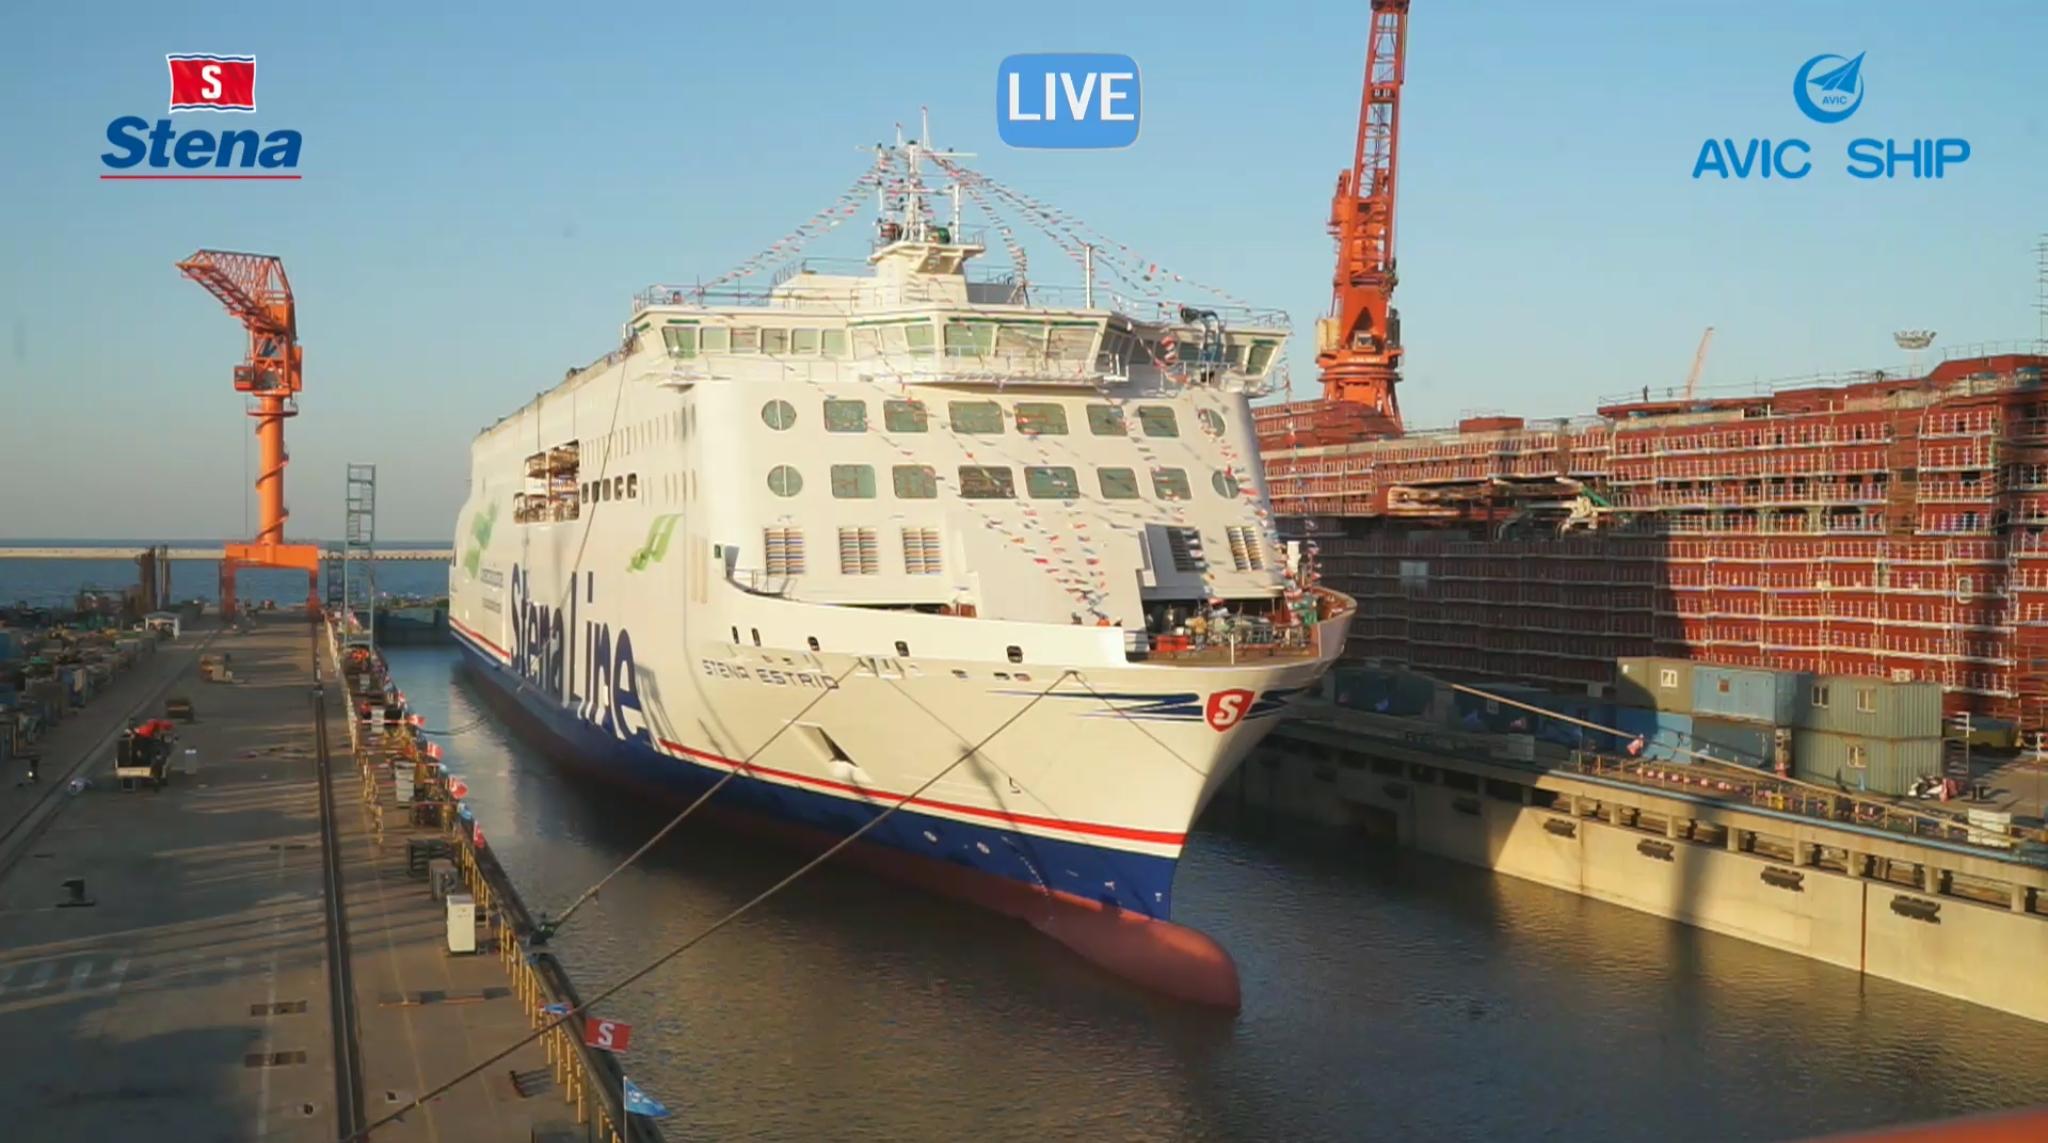 The first Stena E-Flexer, STENA ESTRID, prepares to leave the building dock at AVIC Weihai. Stena Ab / AVIC Weihai.